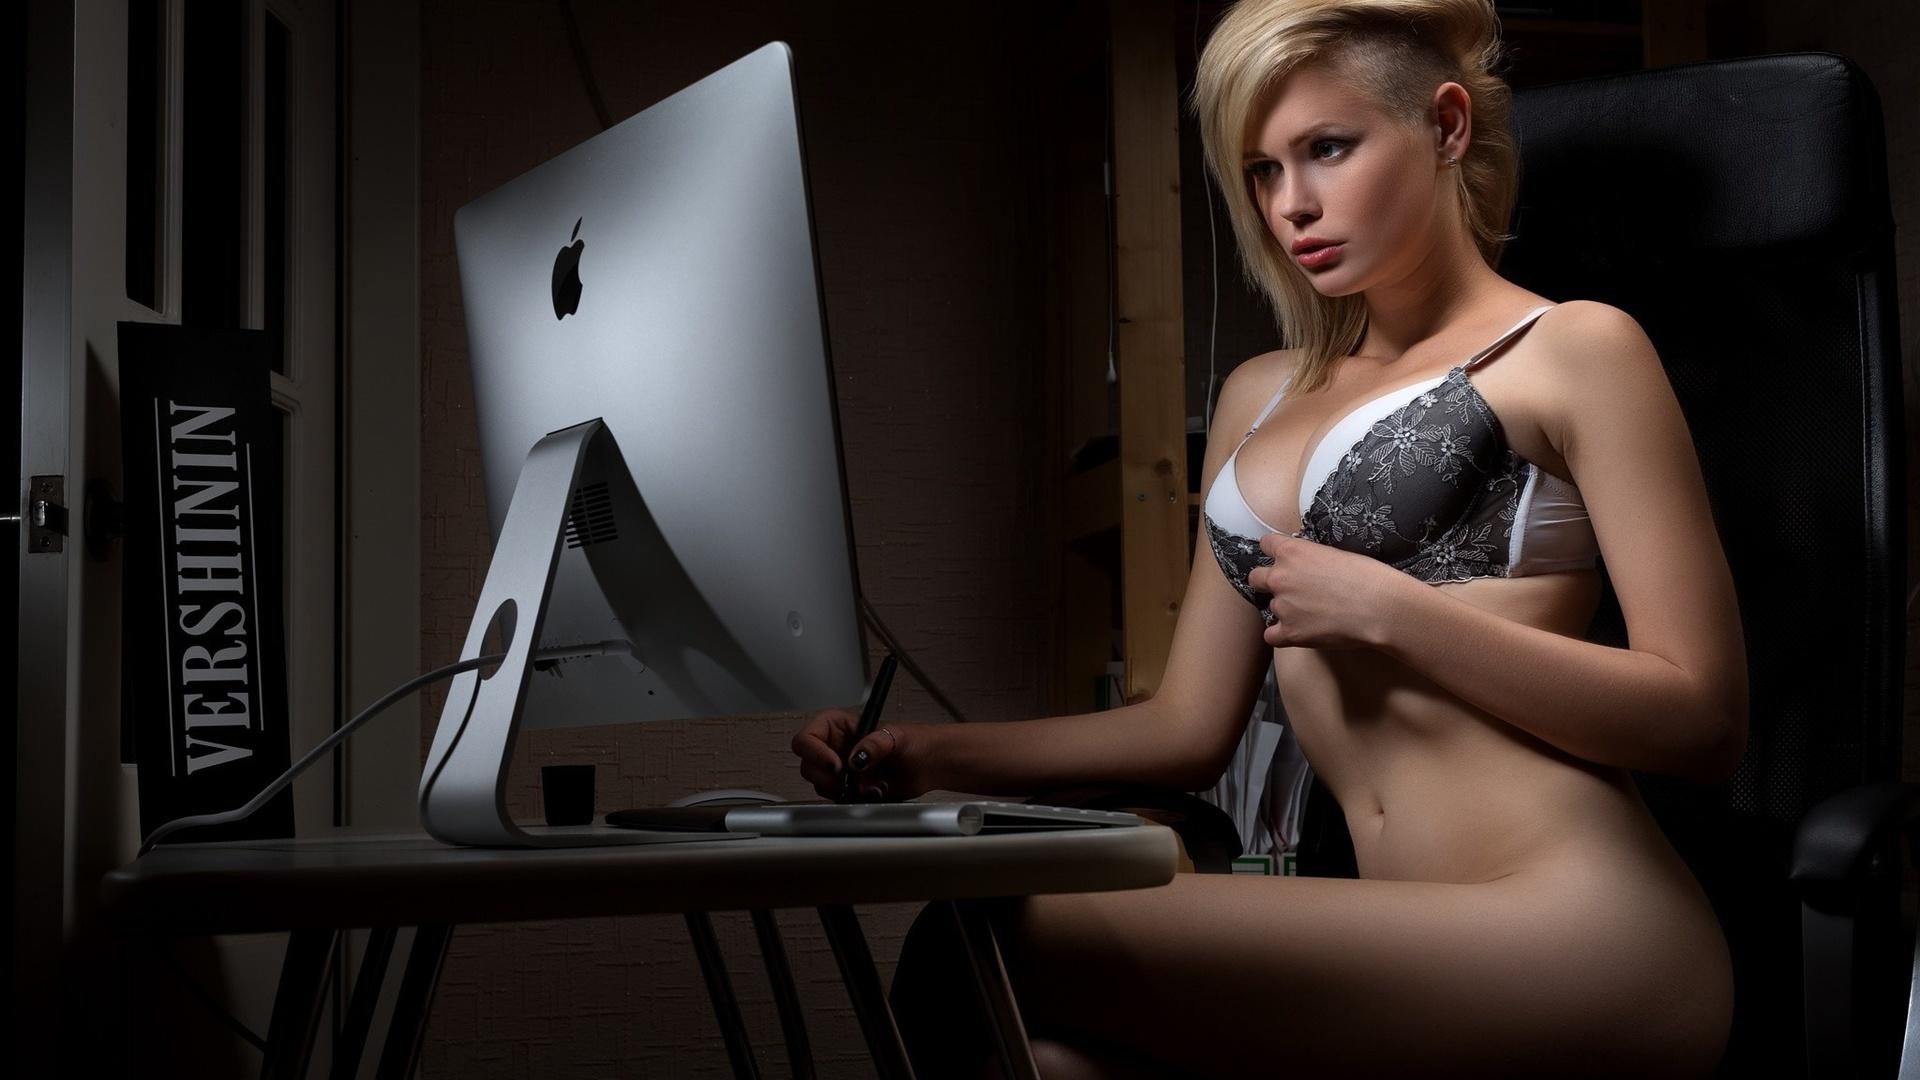 Teen Computer Nude 22